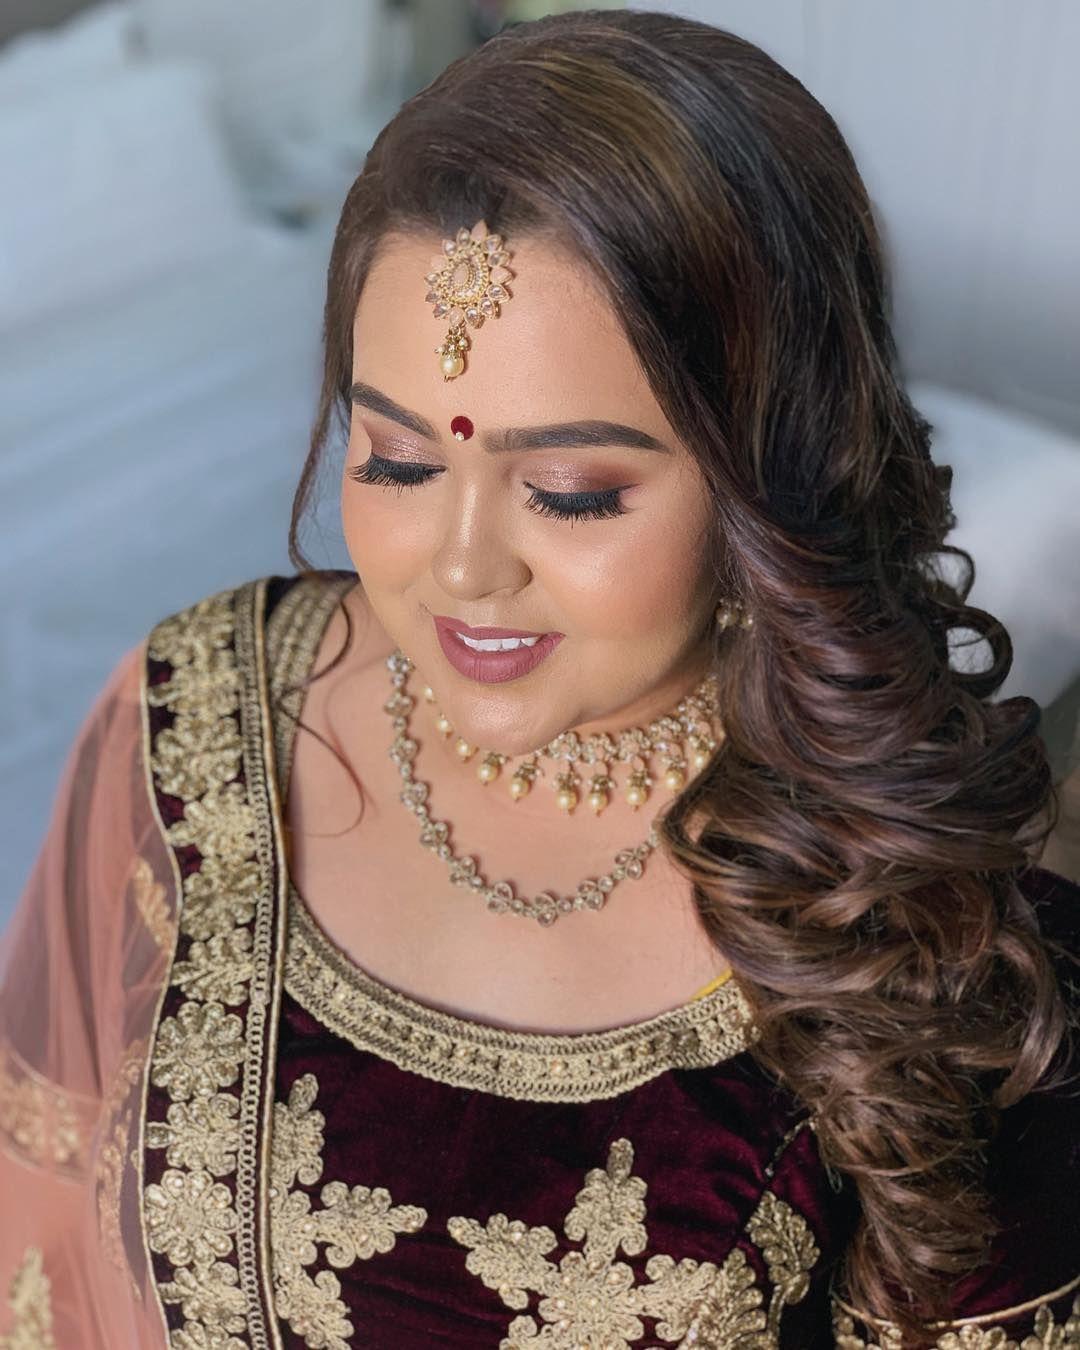 mehala_92 on her wedding reception